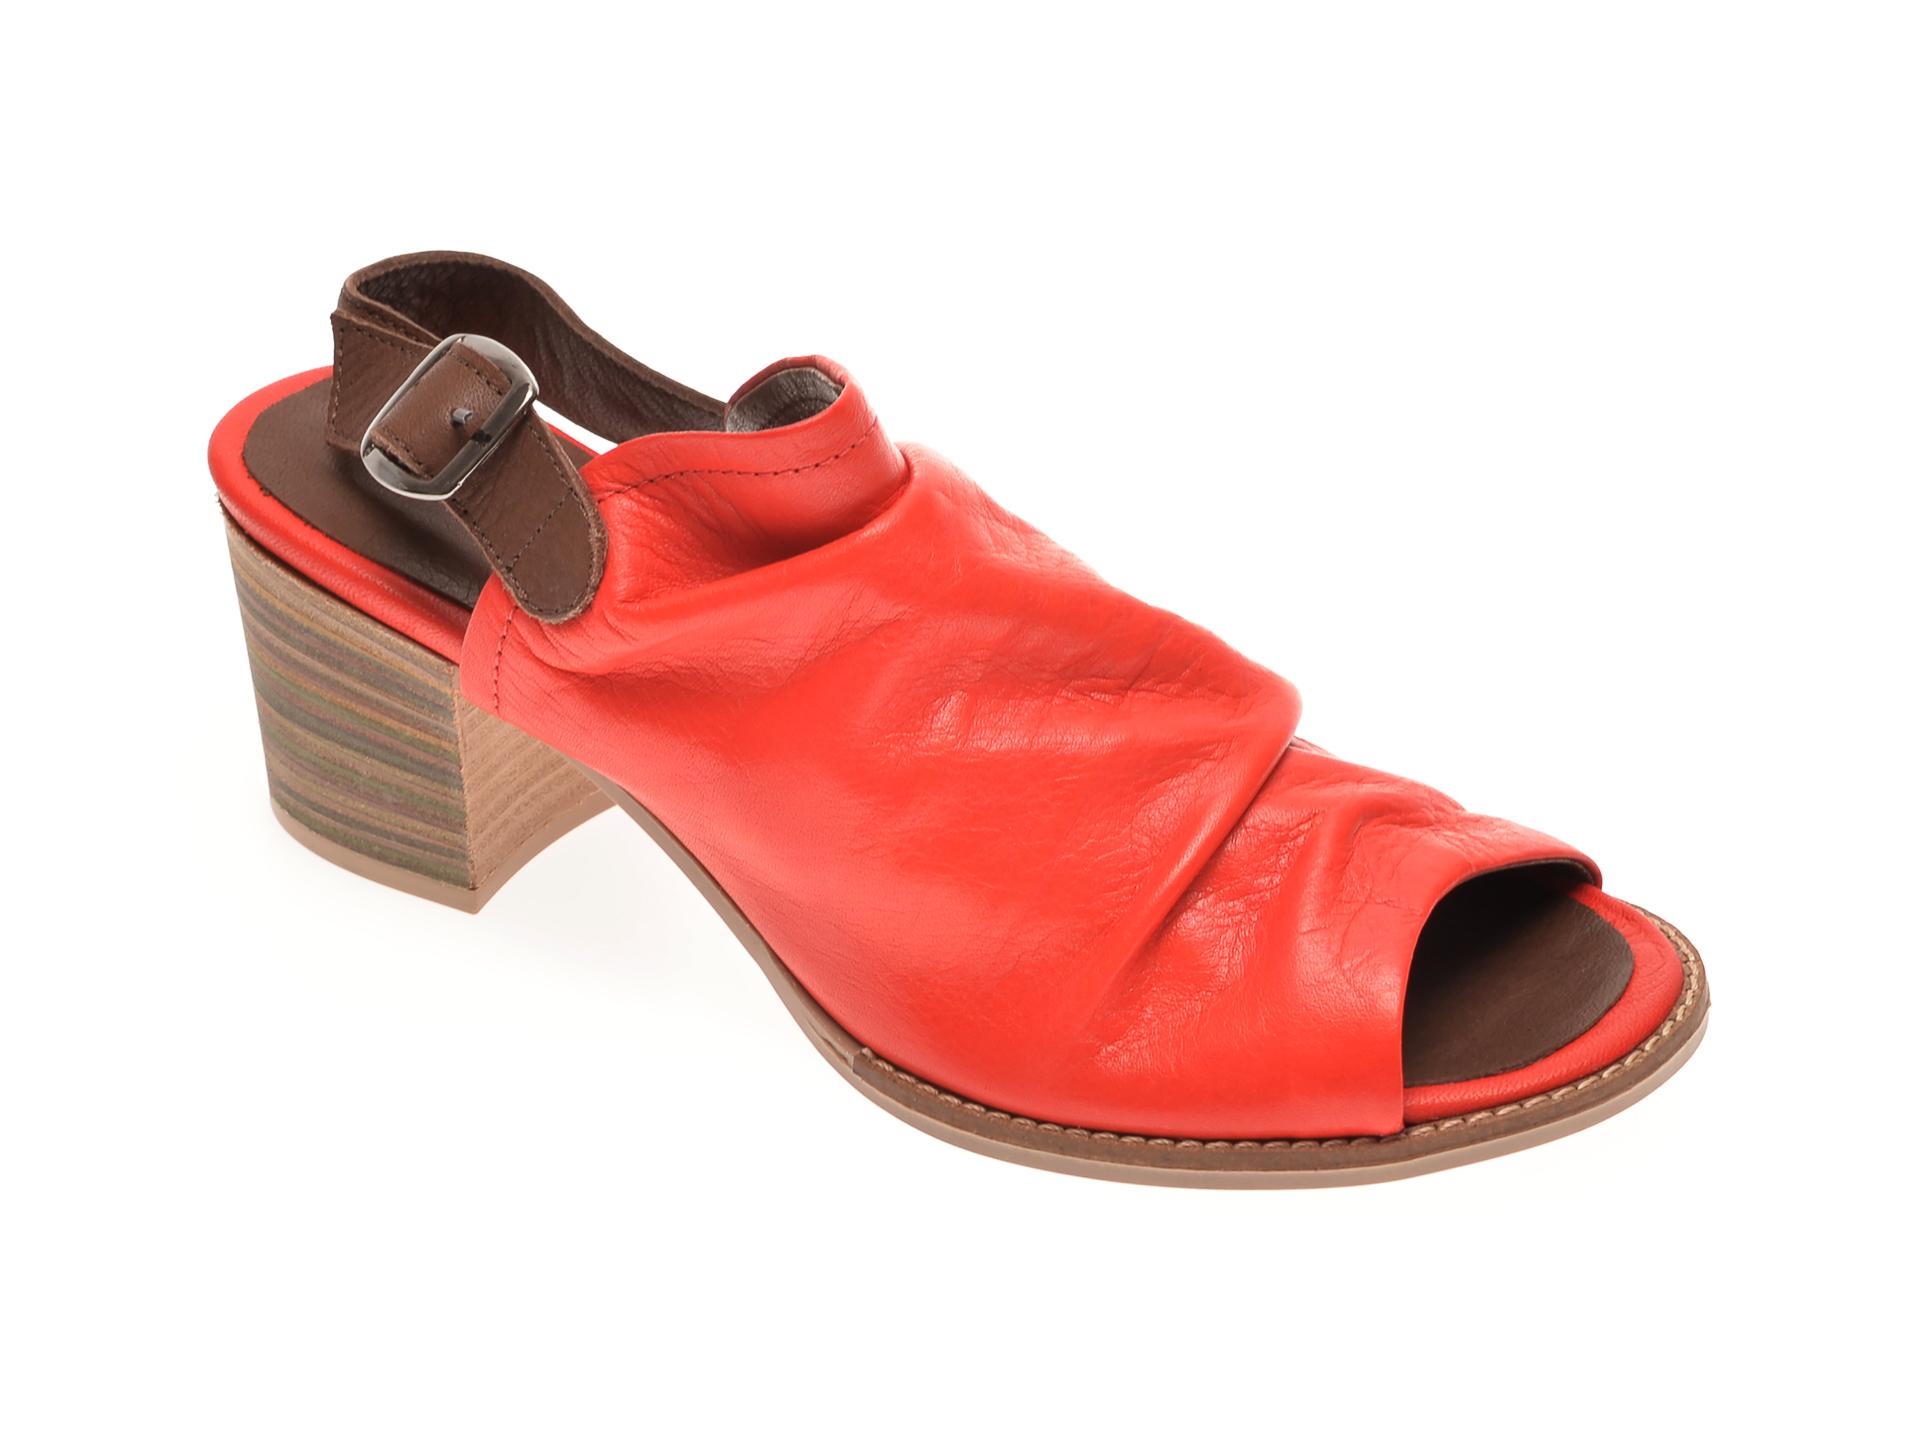 Sandale BABOOS rosii, 1702, din piele naturala